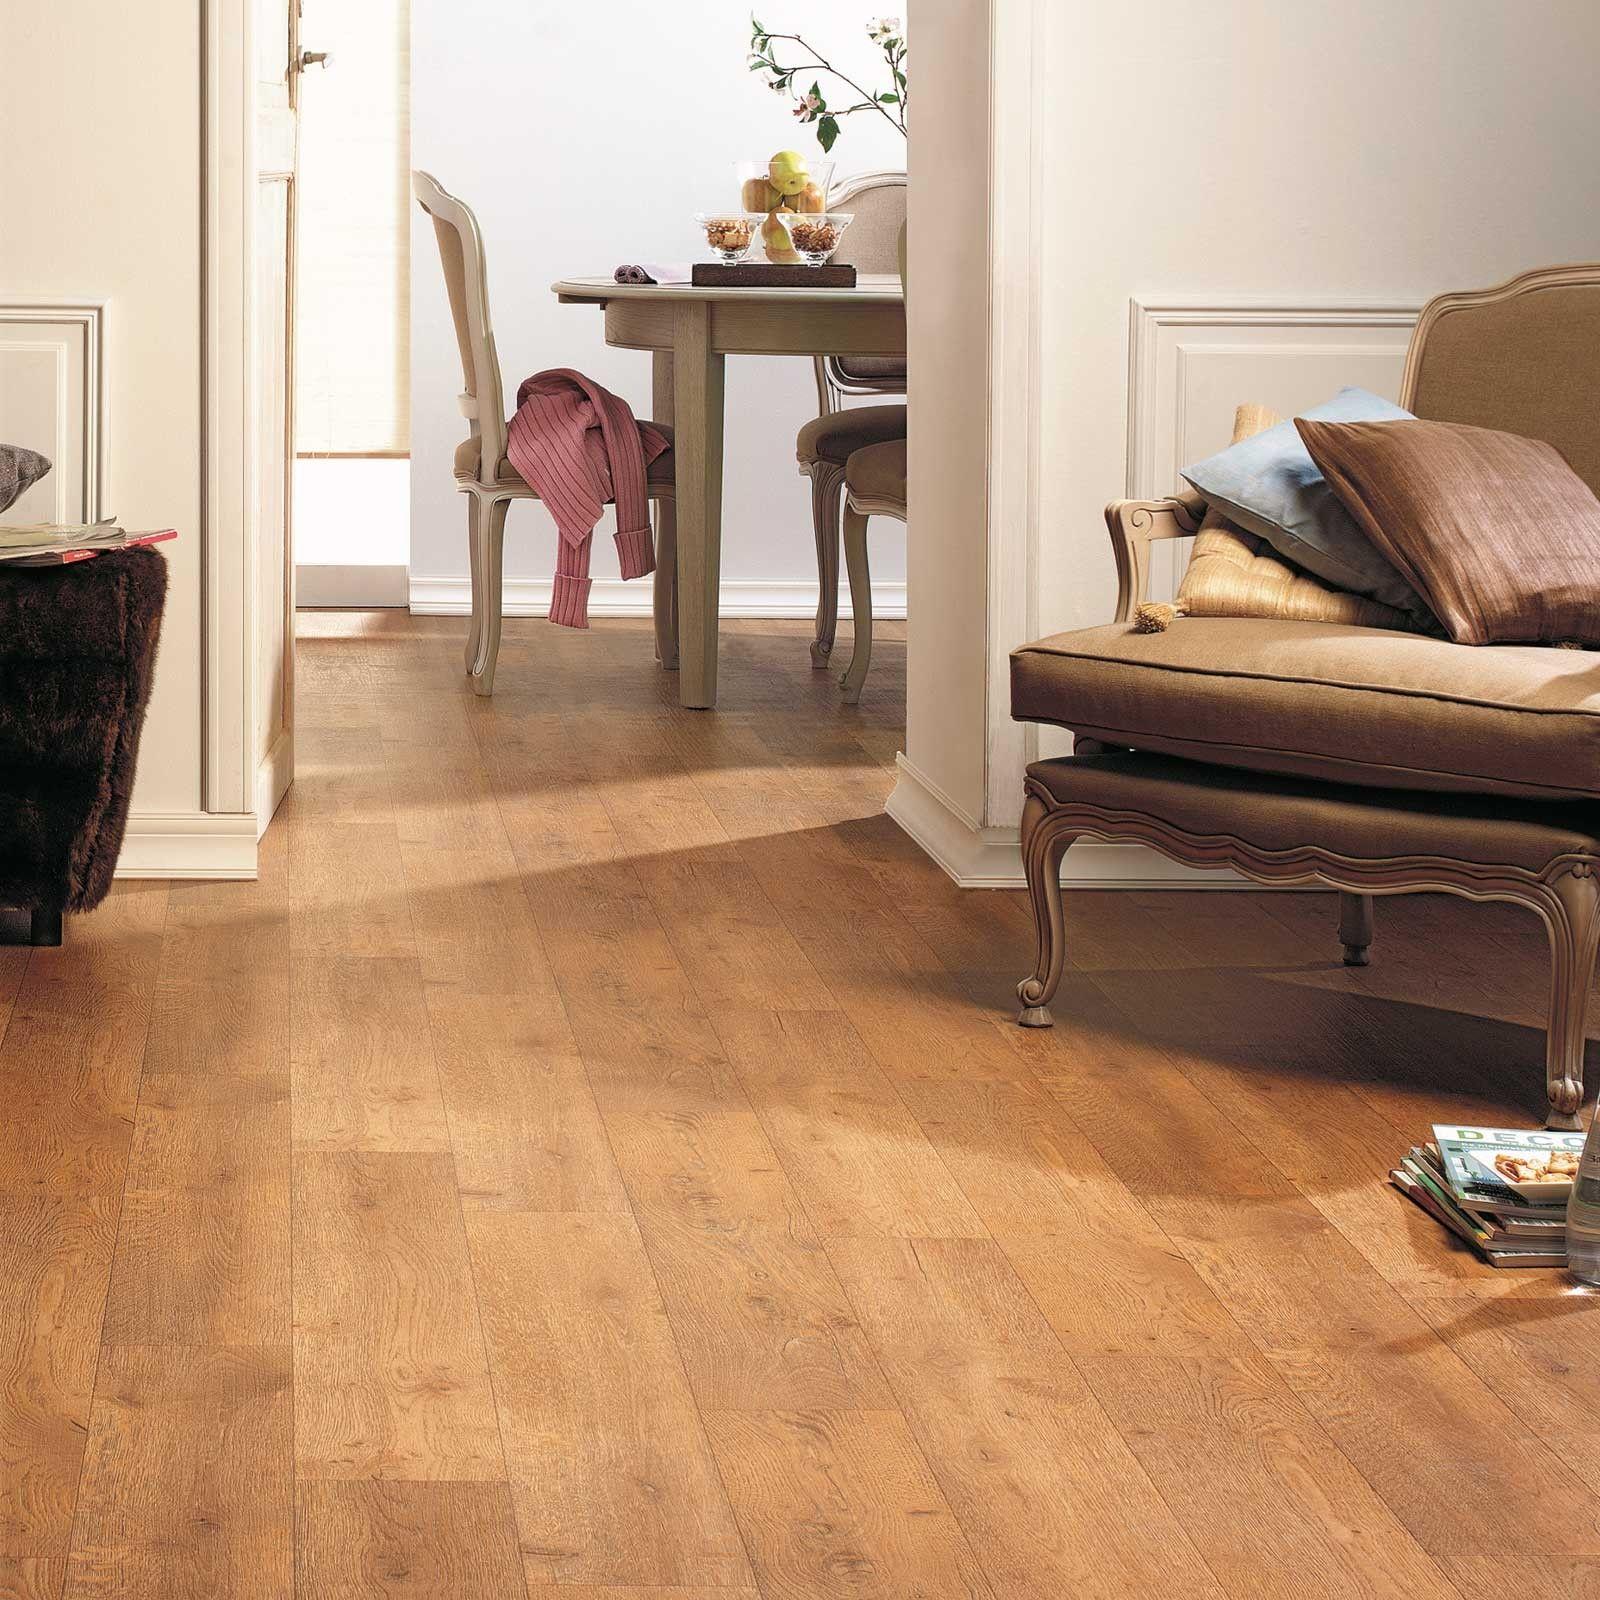 Presto Wood Vinyl Flooring Buy Tile Effect Lino